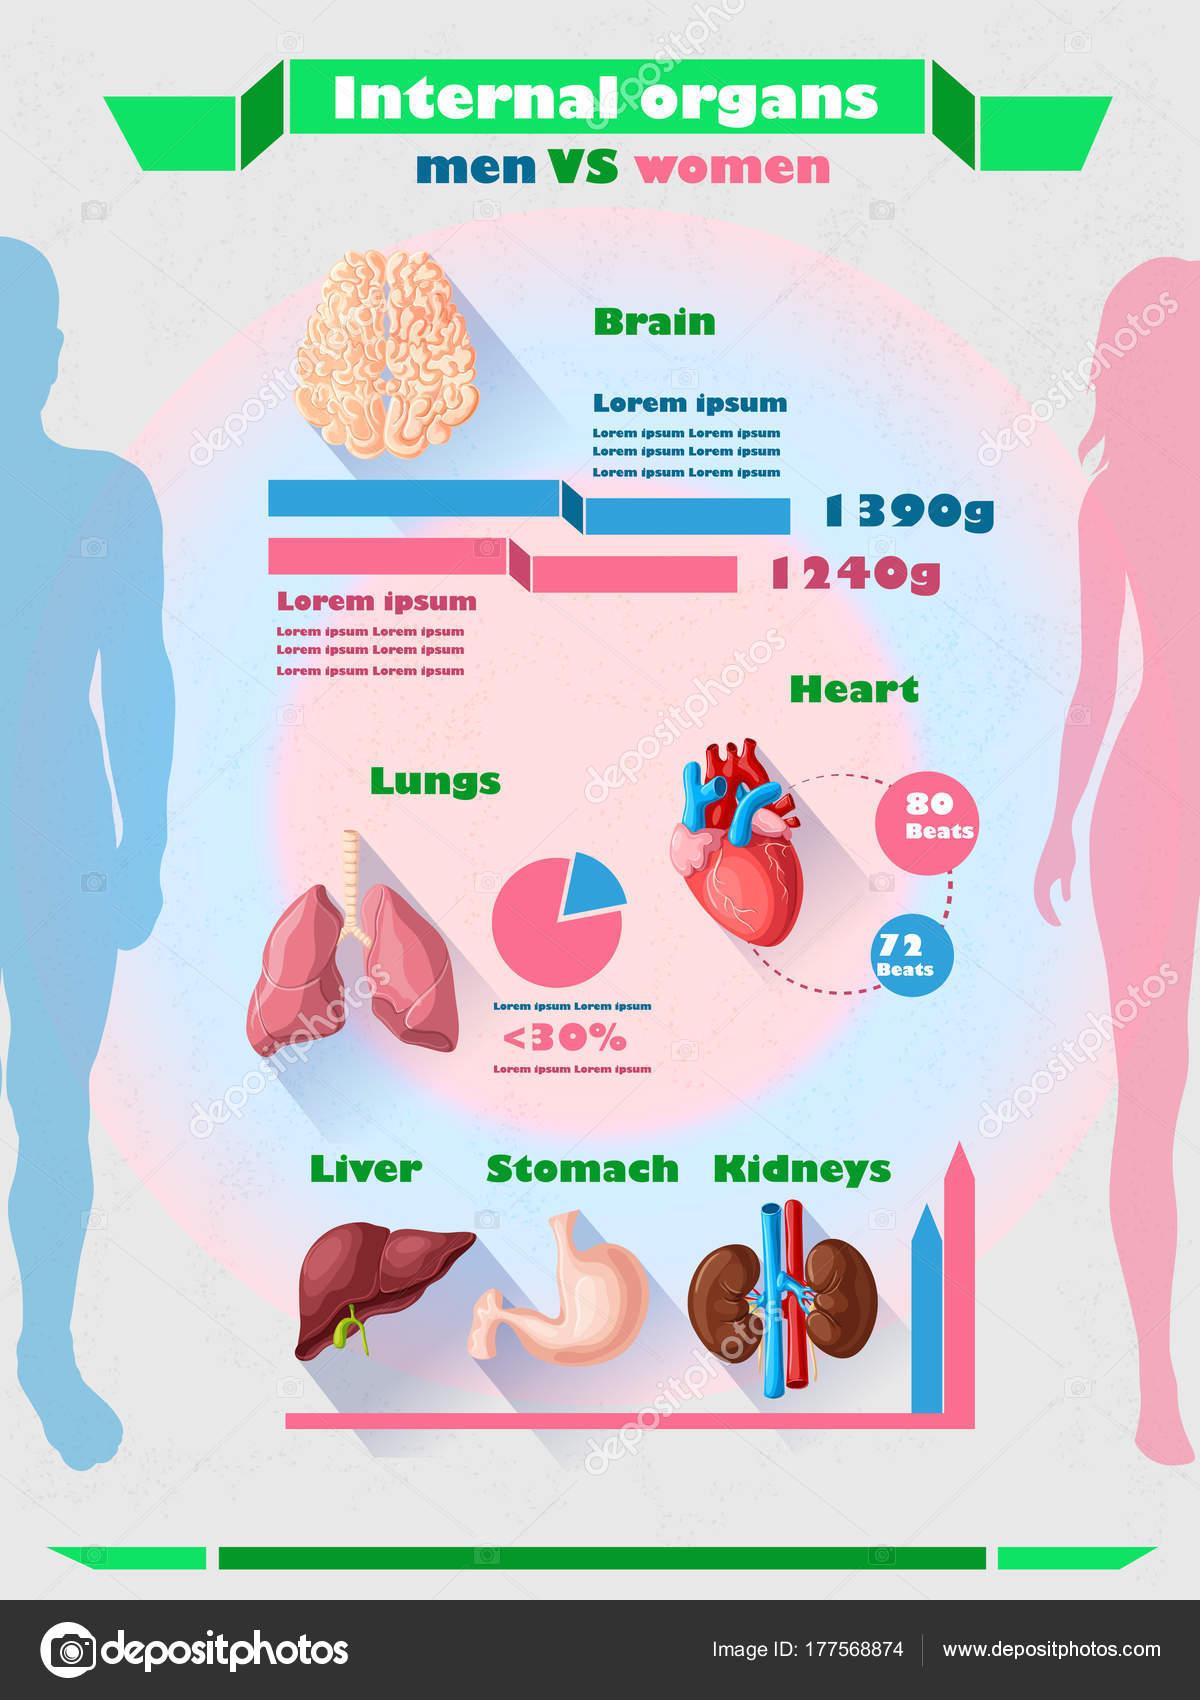 Menschliche Organe Infografik Vorlage — Stockvektor © Mogil #177568874